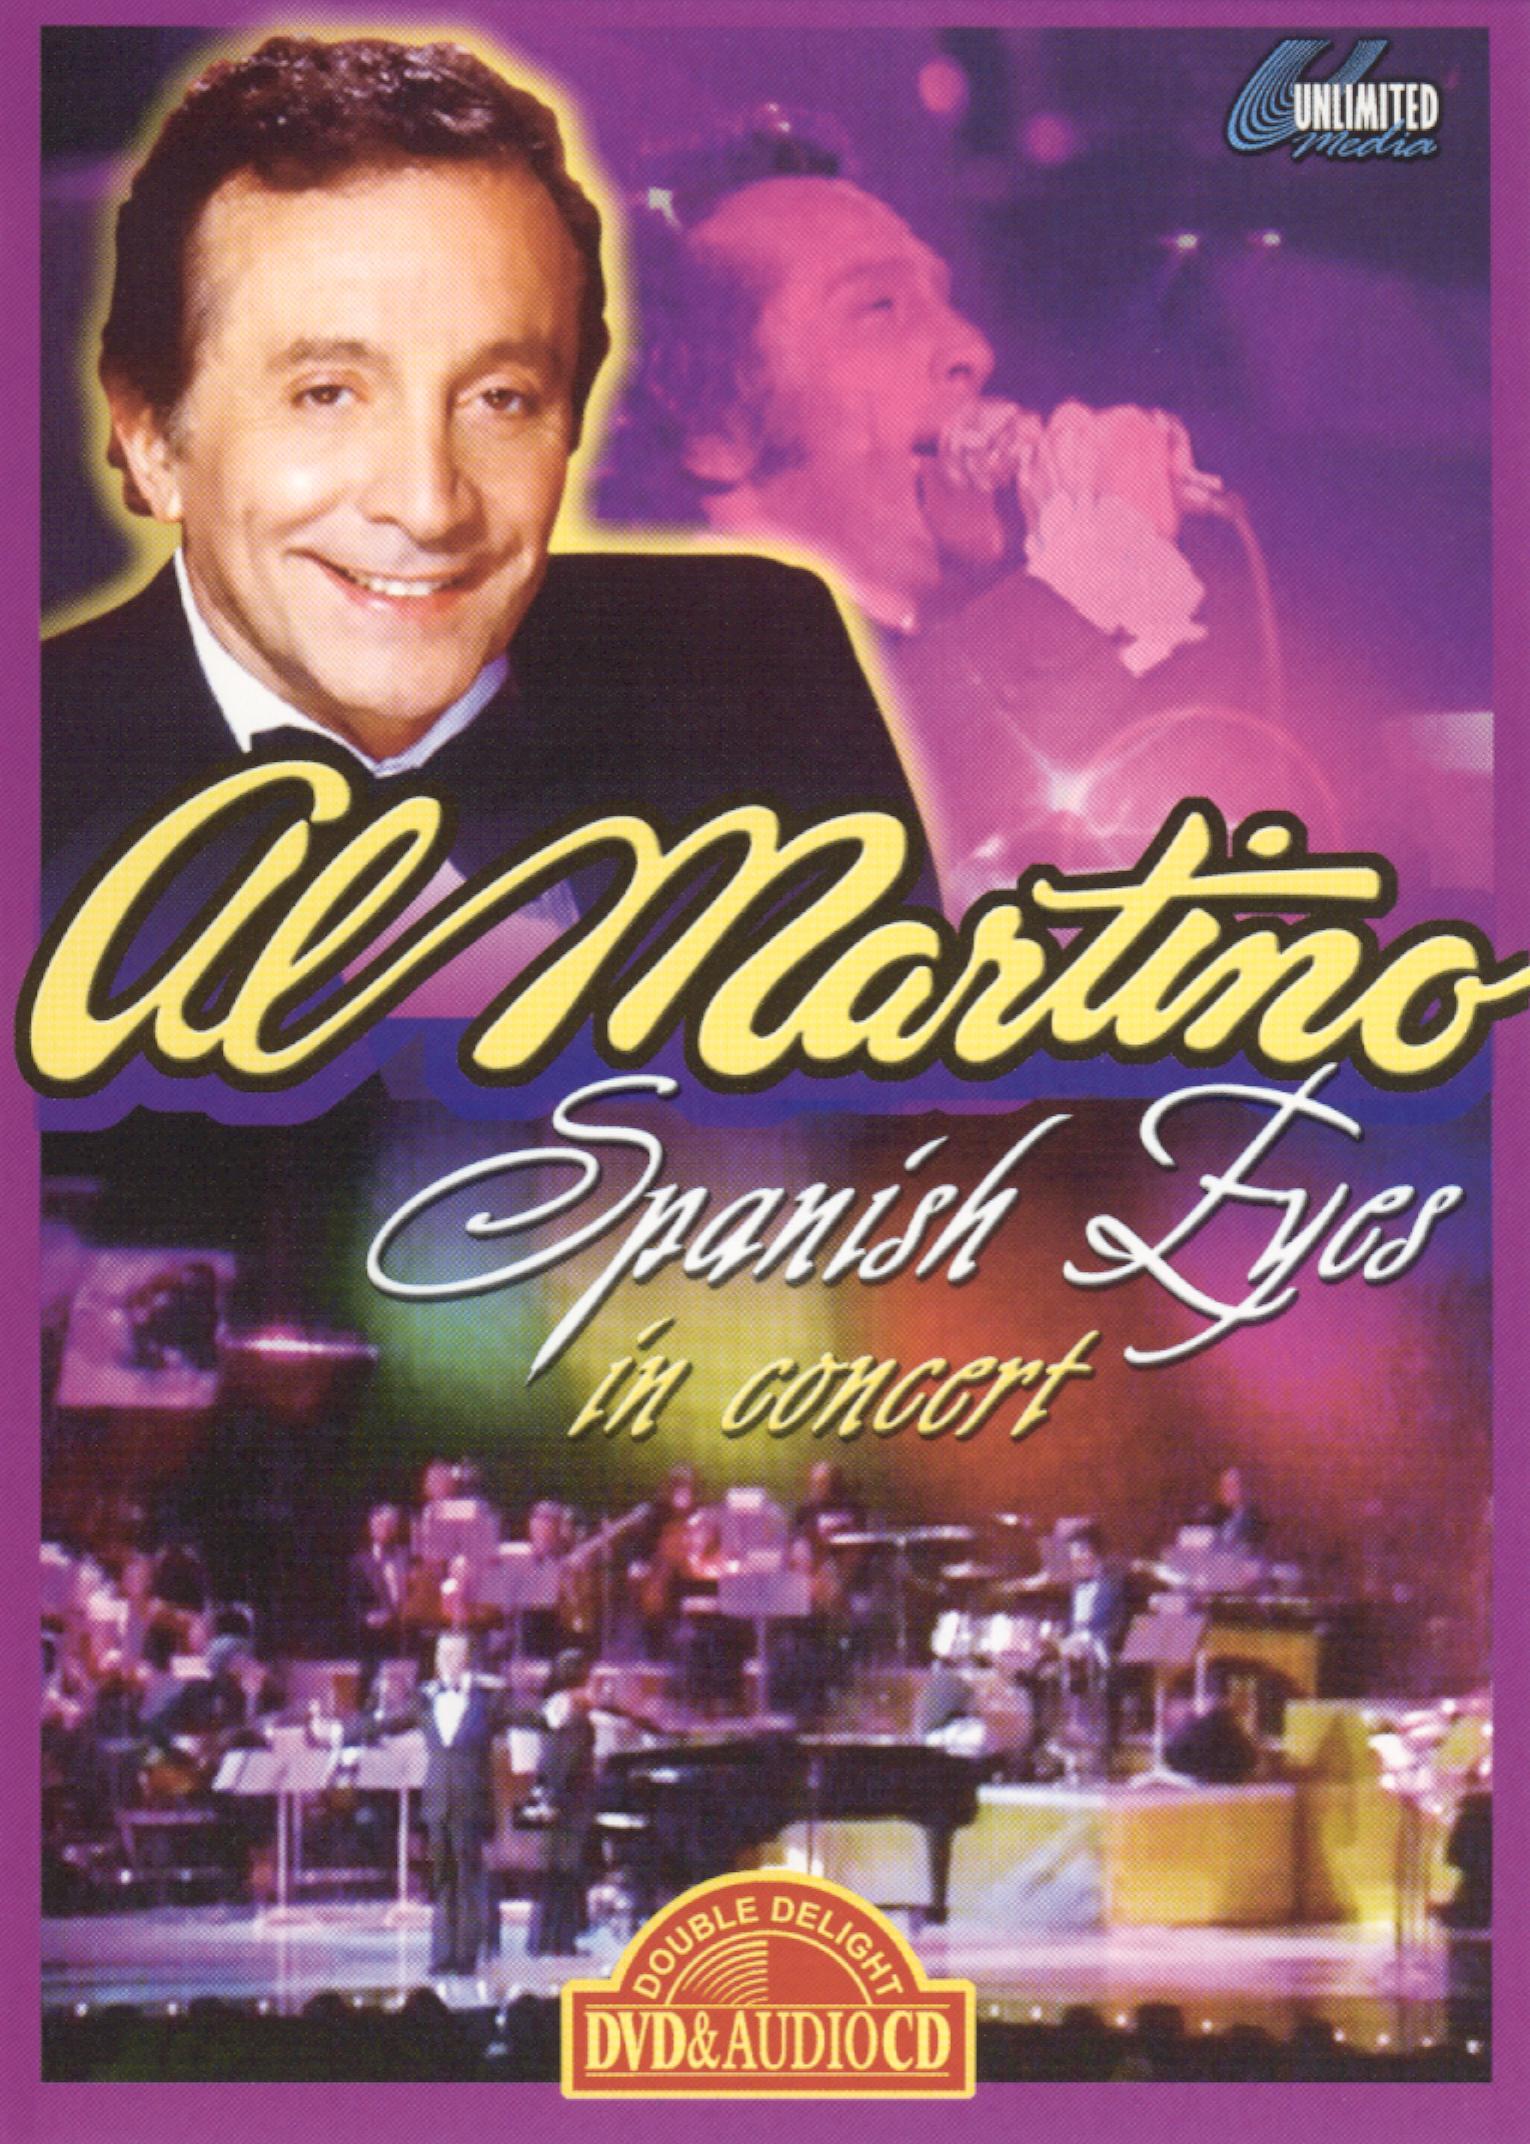 Al Martino: Spanish Eyes - In Concert